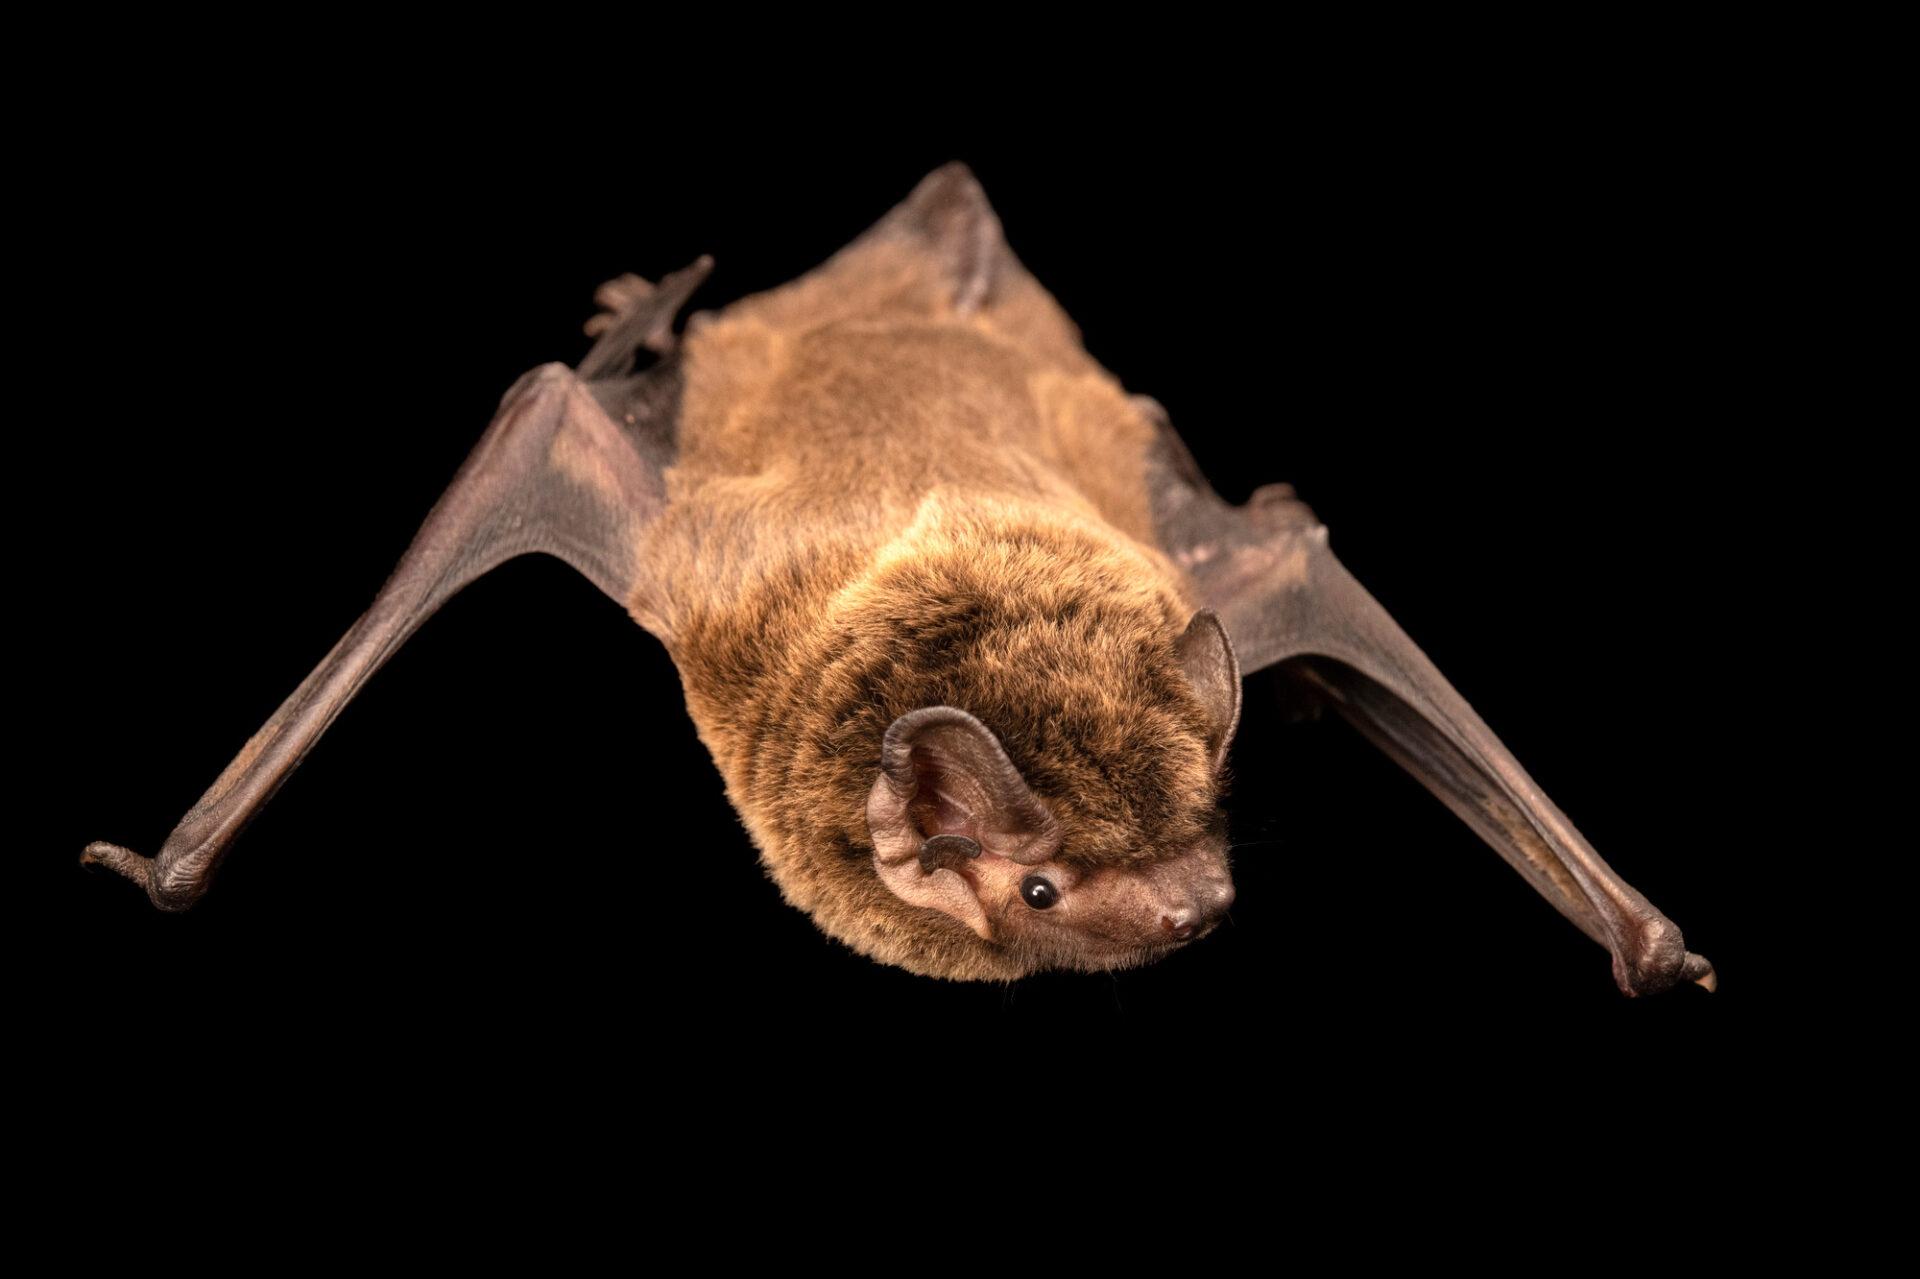 Photo: A LeislerÕs bat, Nyctalus leisleri, at Wildwood Trust near Canterbury, England.